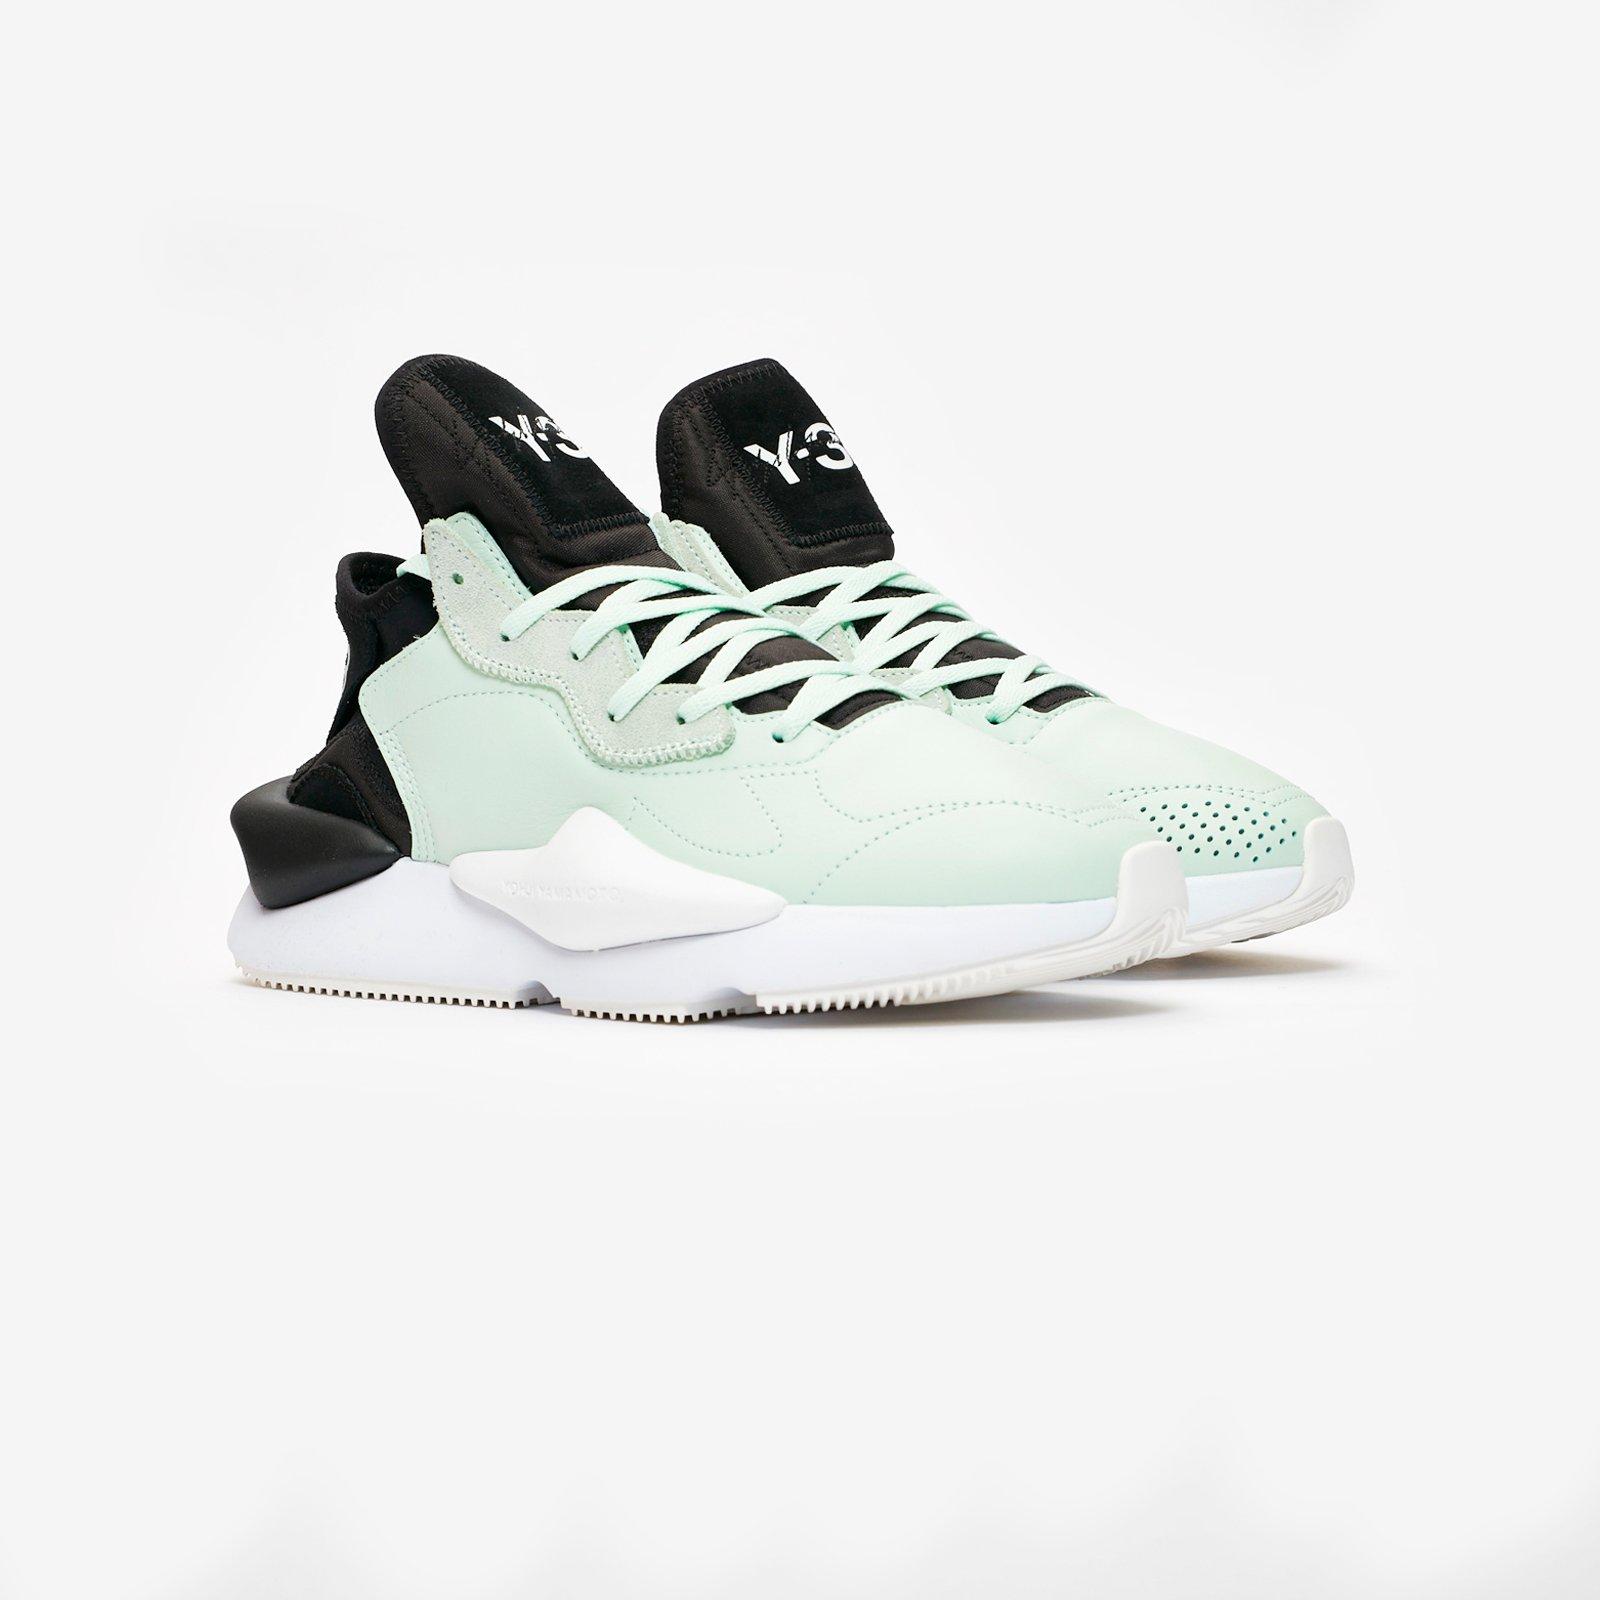 adidas Y 3 Kaiwa F97414 Sneakersnstuff I Sneakers